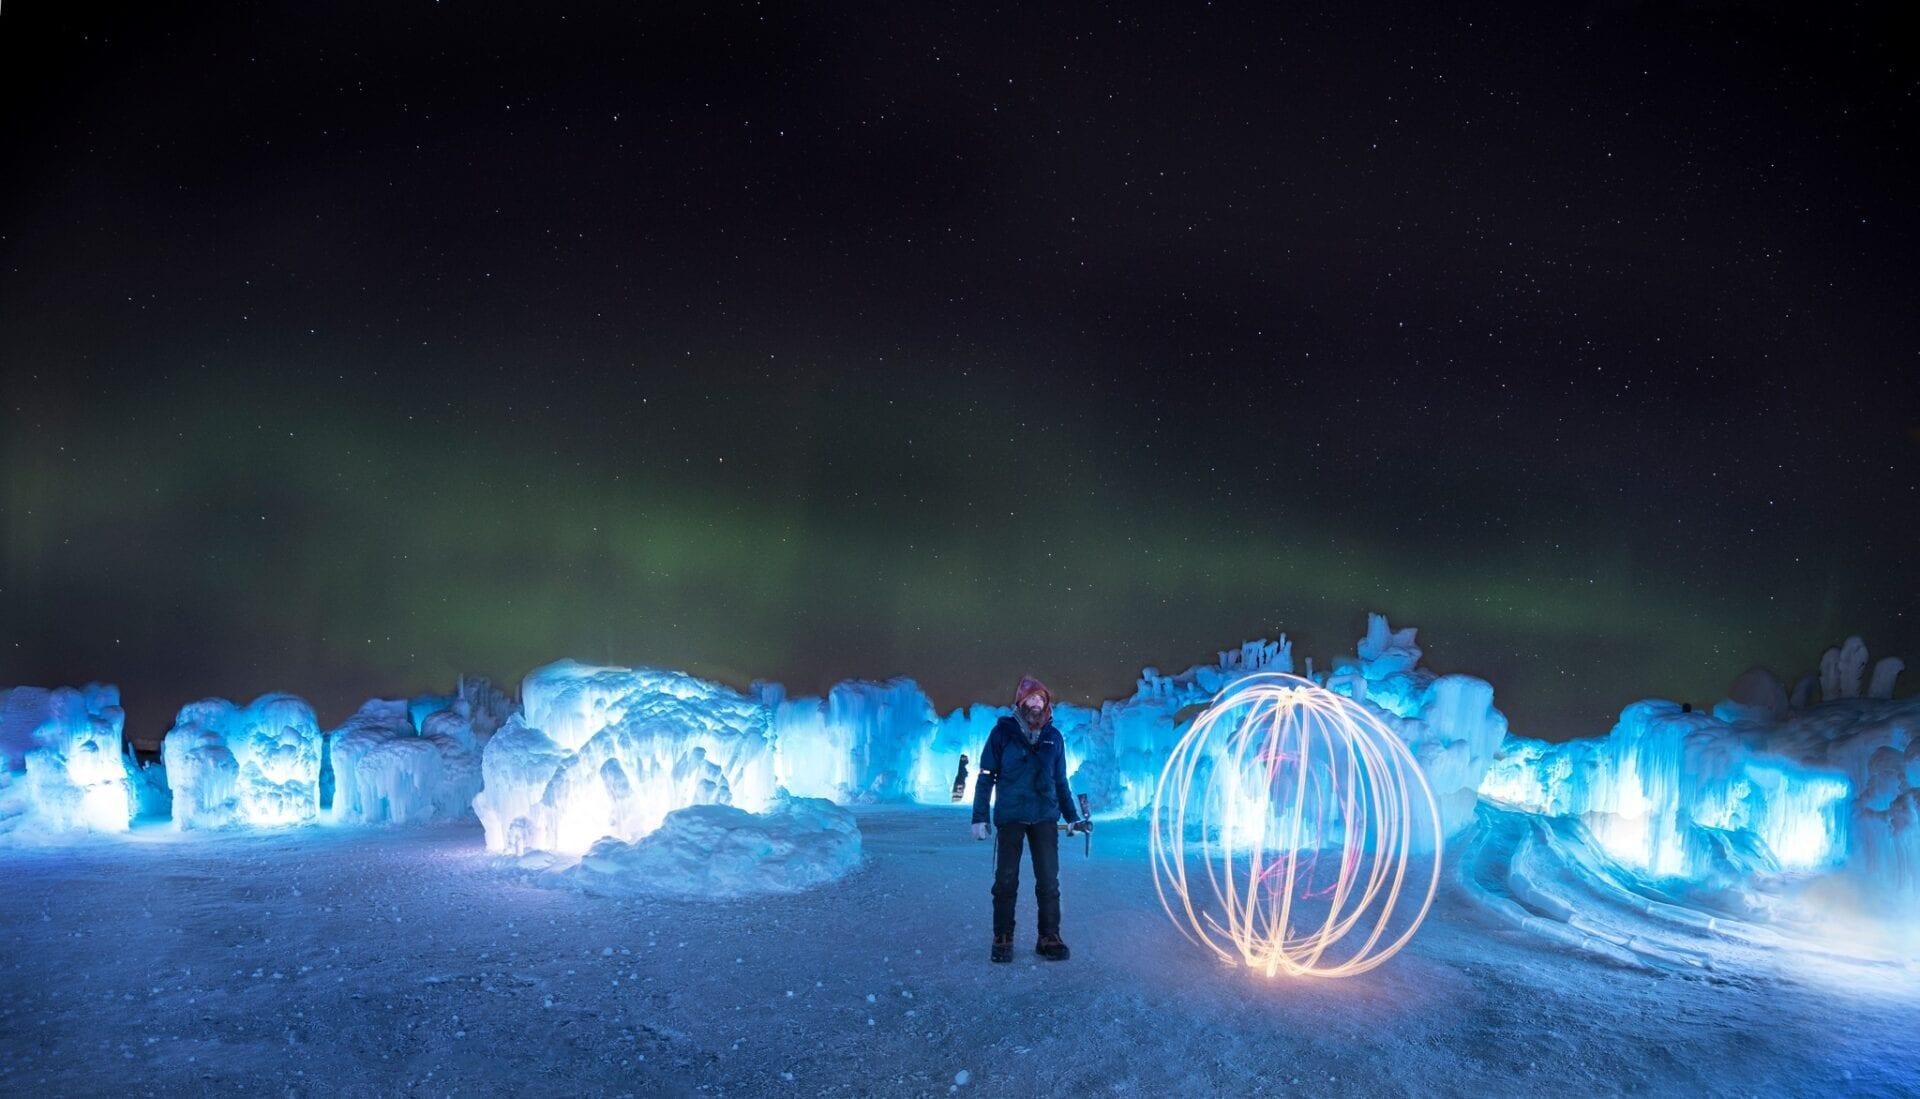 Ice Castles Edmonton Alberta Winter Visit Hawrelak Park-012